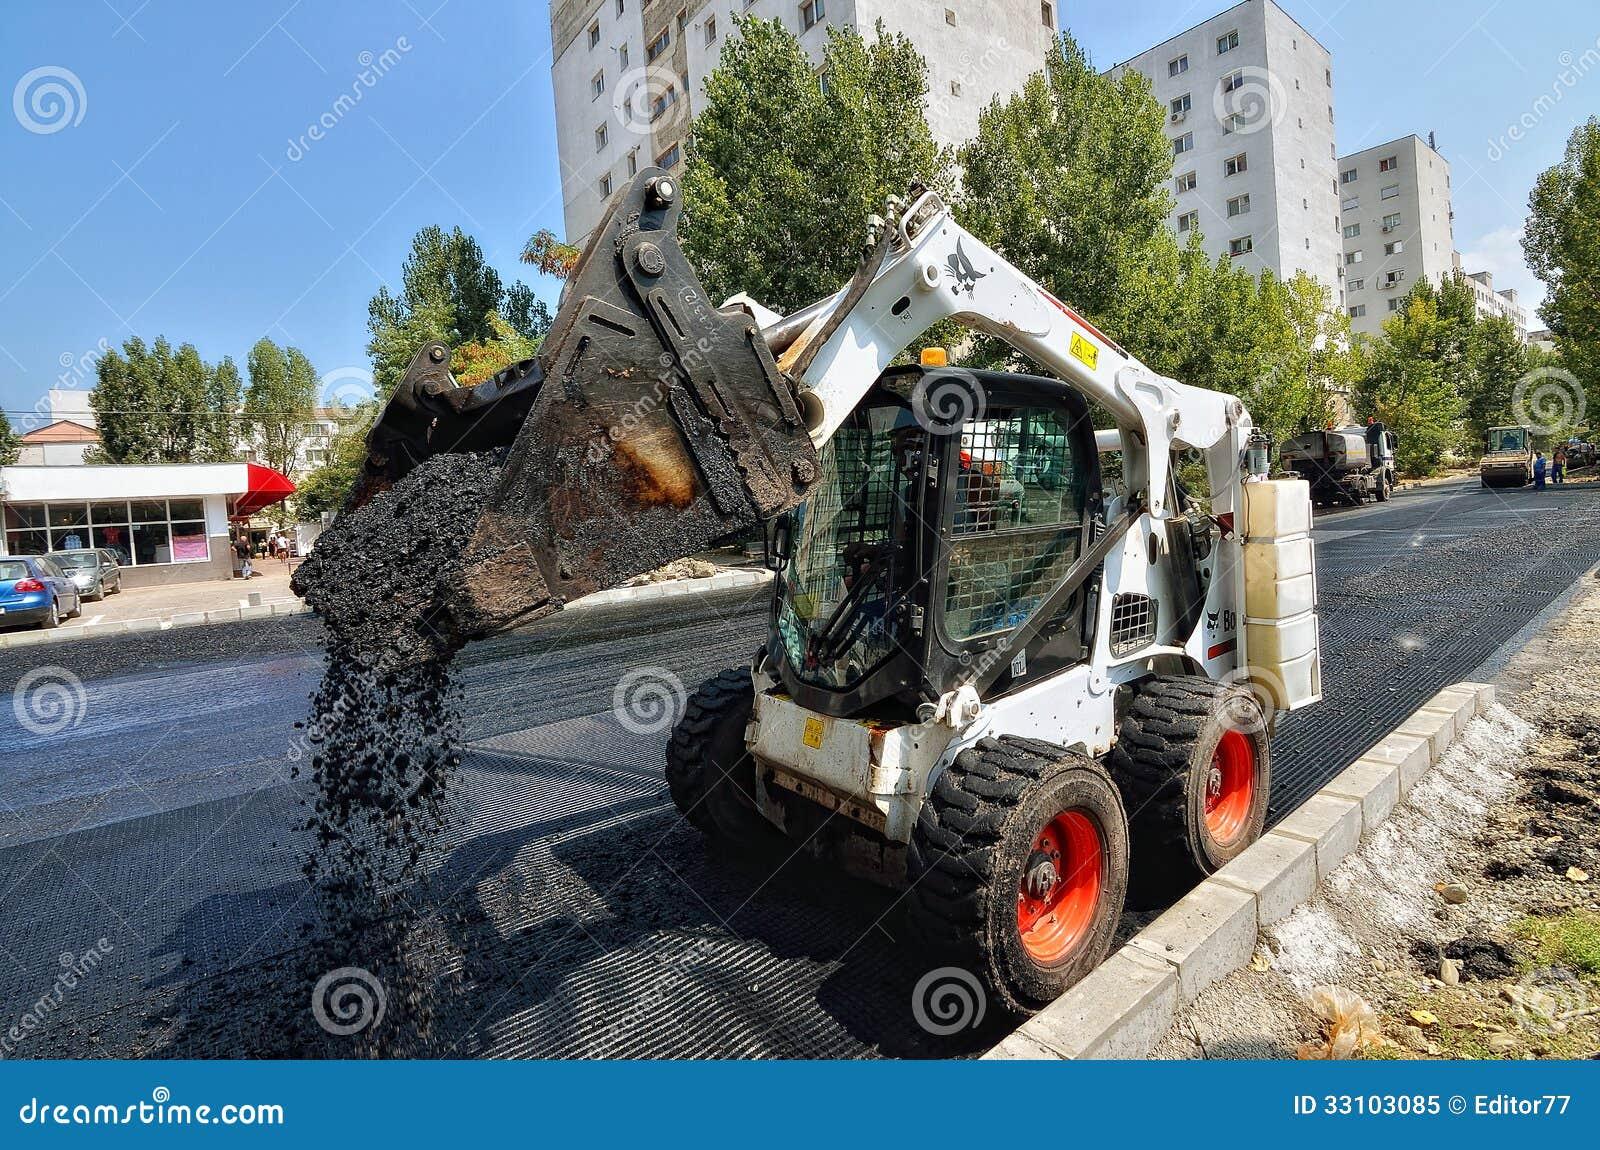 Skid Steer Prices >> Caterpillar Skid Steer Loader At Work Editorial Image - Image: 33103085